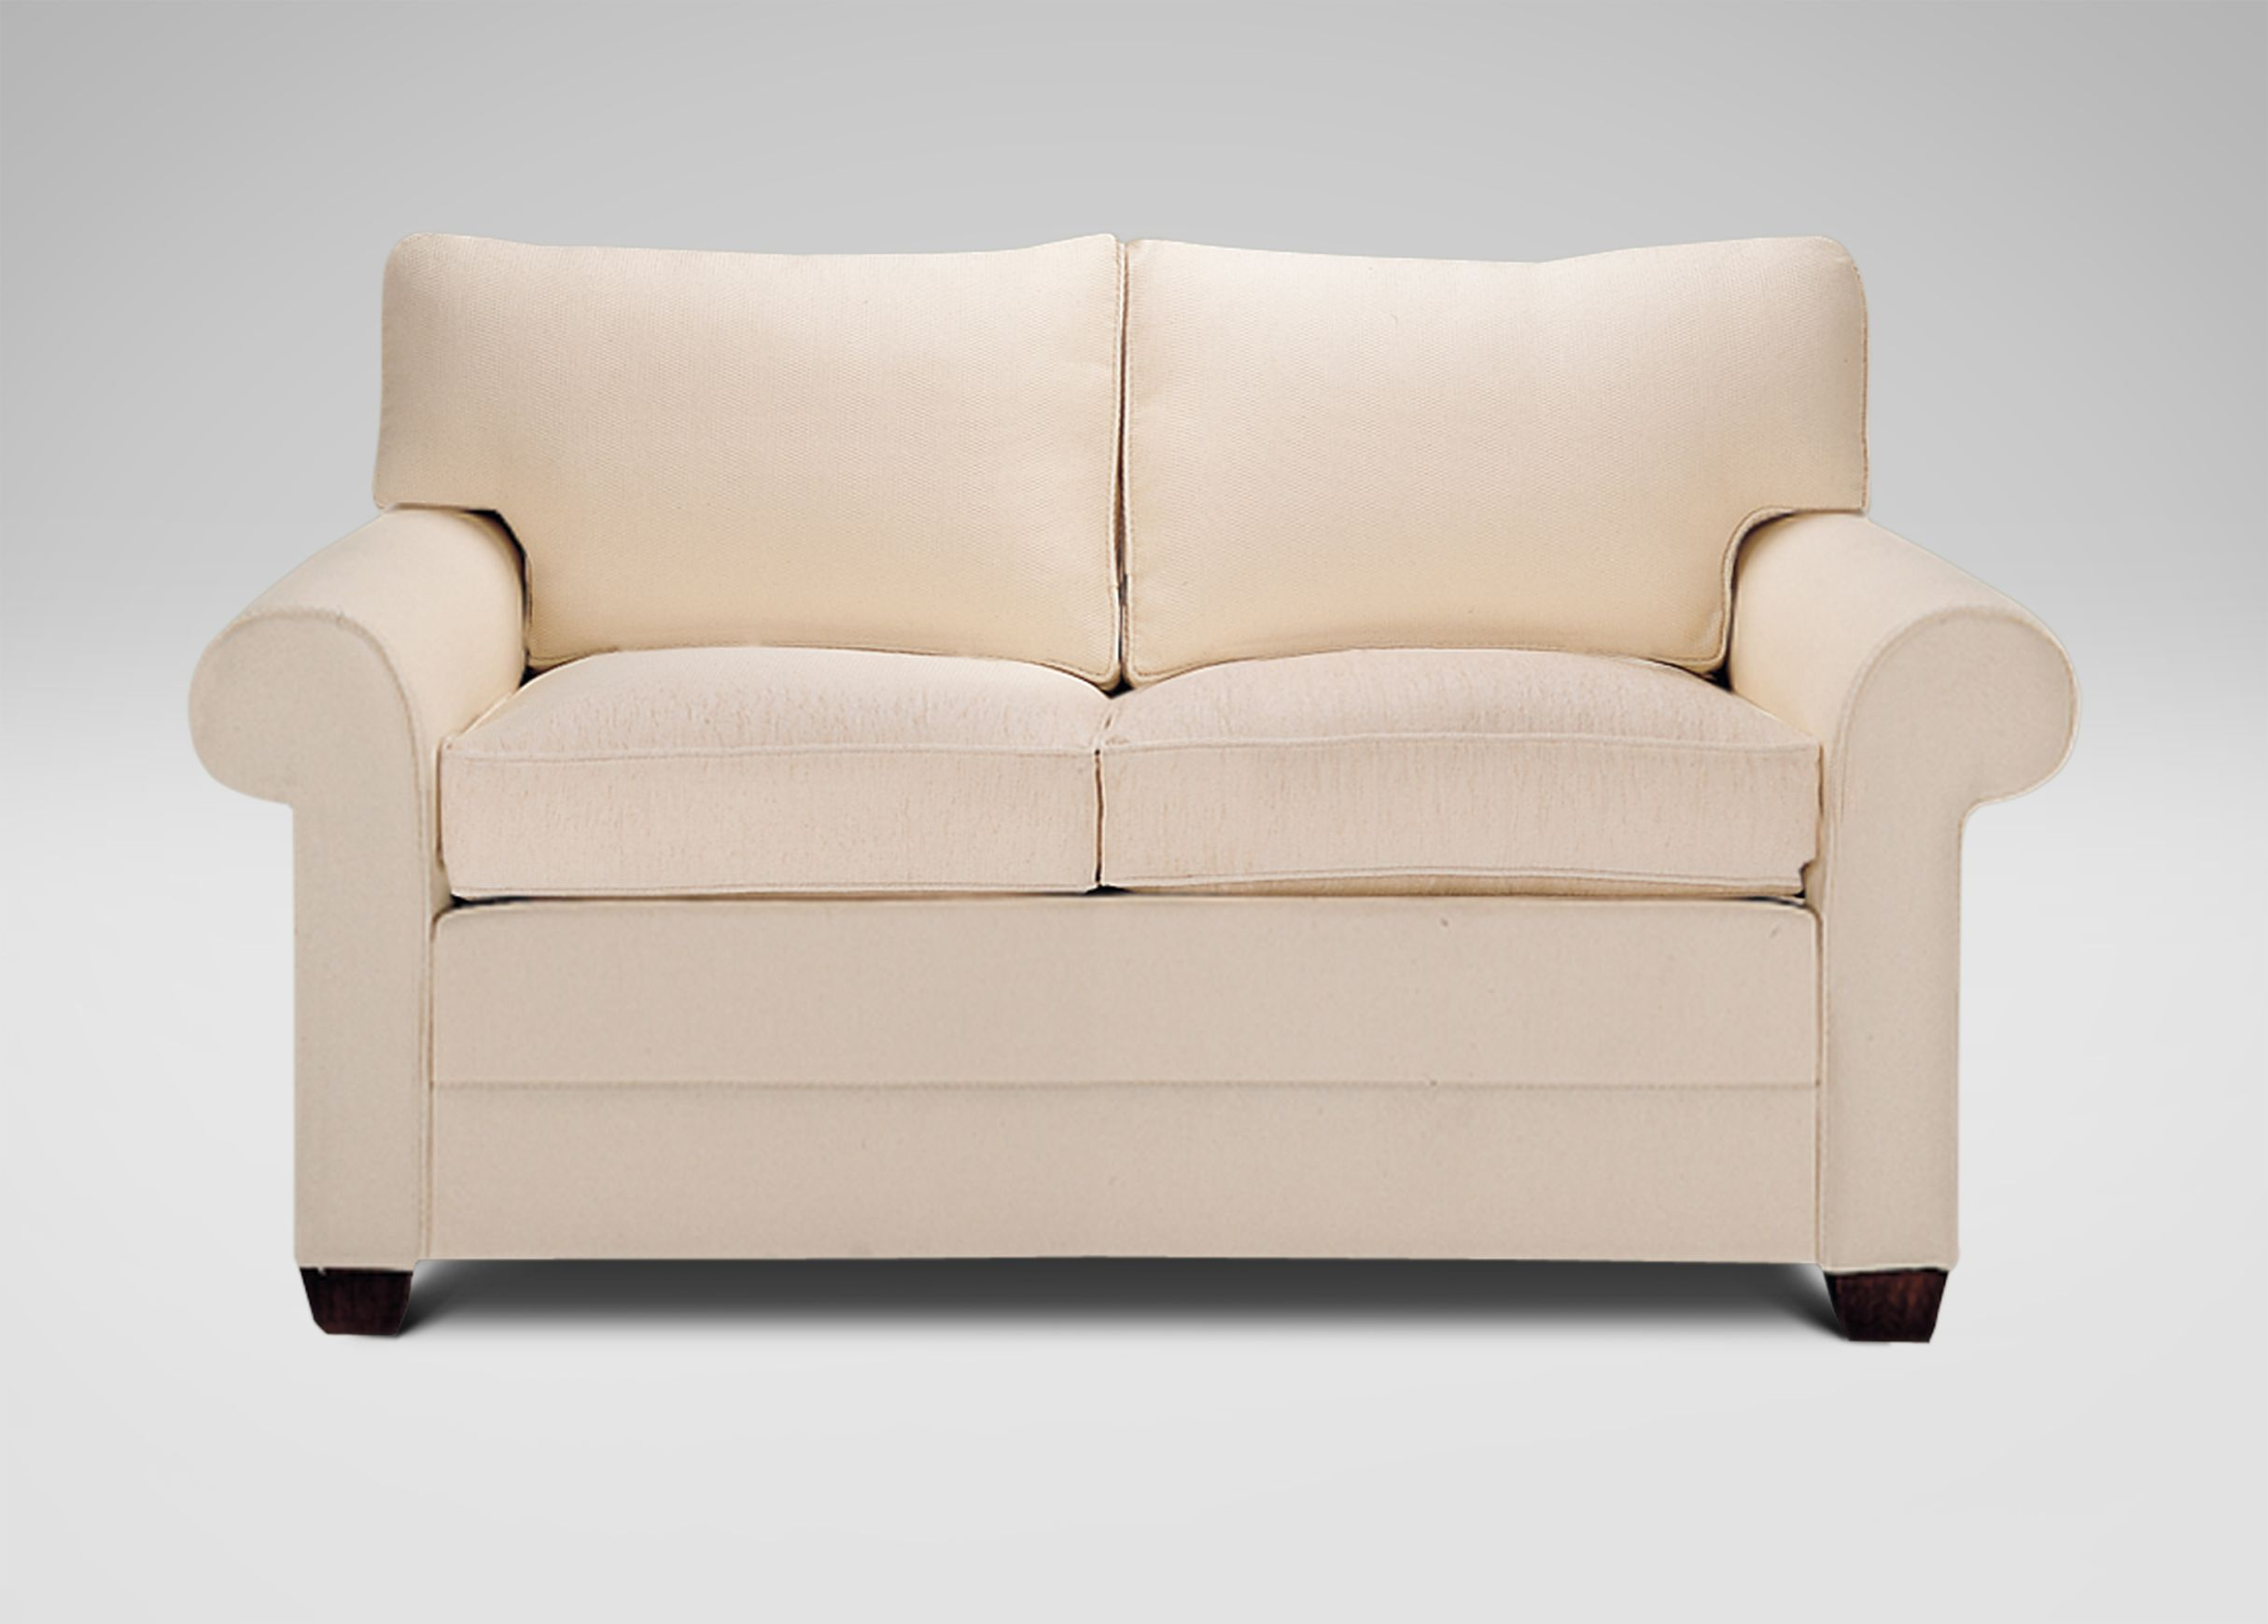 Gbr Bennett Roll Arm Sofa